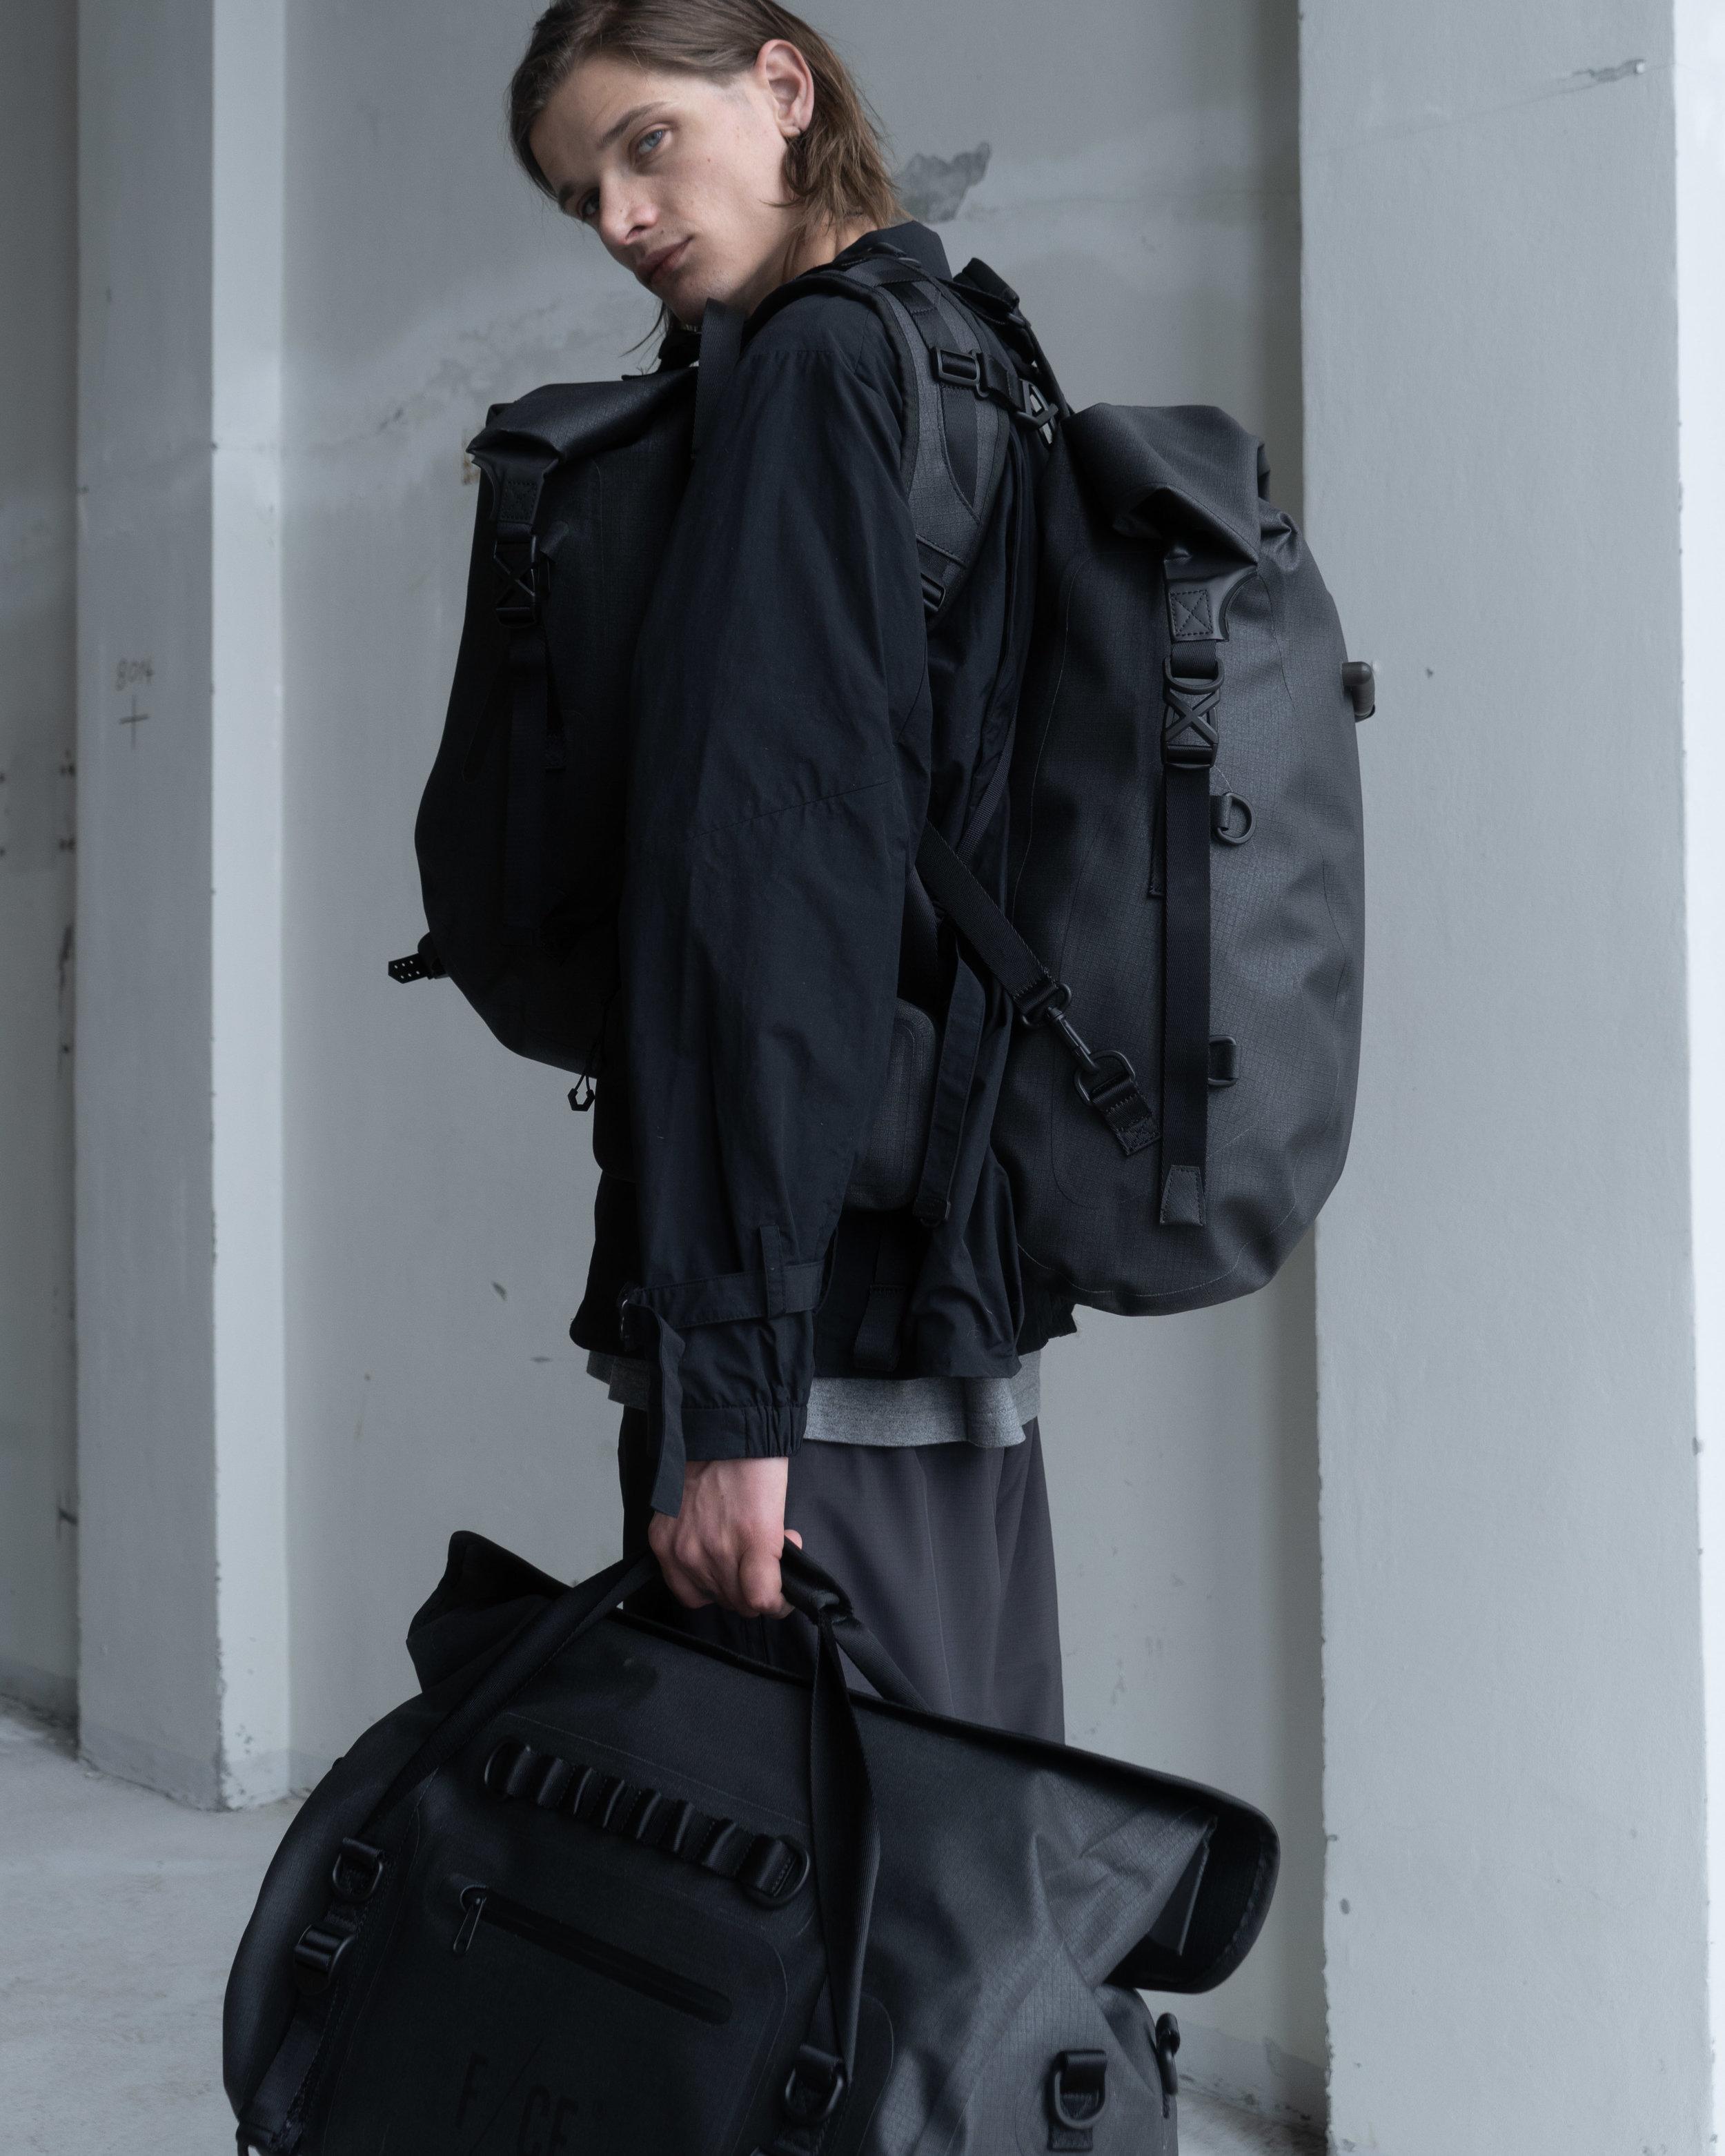 F/CE - N.M.B Hunting Jacket   F/CE - No Seam 3Way Duffle Bag   F/CE - No Seam Zip Lock Bag   F/CE - No Seam Rolltop   F/CE - Travel Sacoche   Patagonia - Baggies Light Shorts